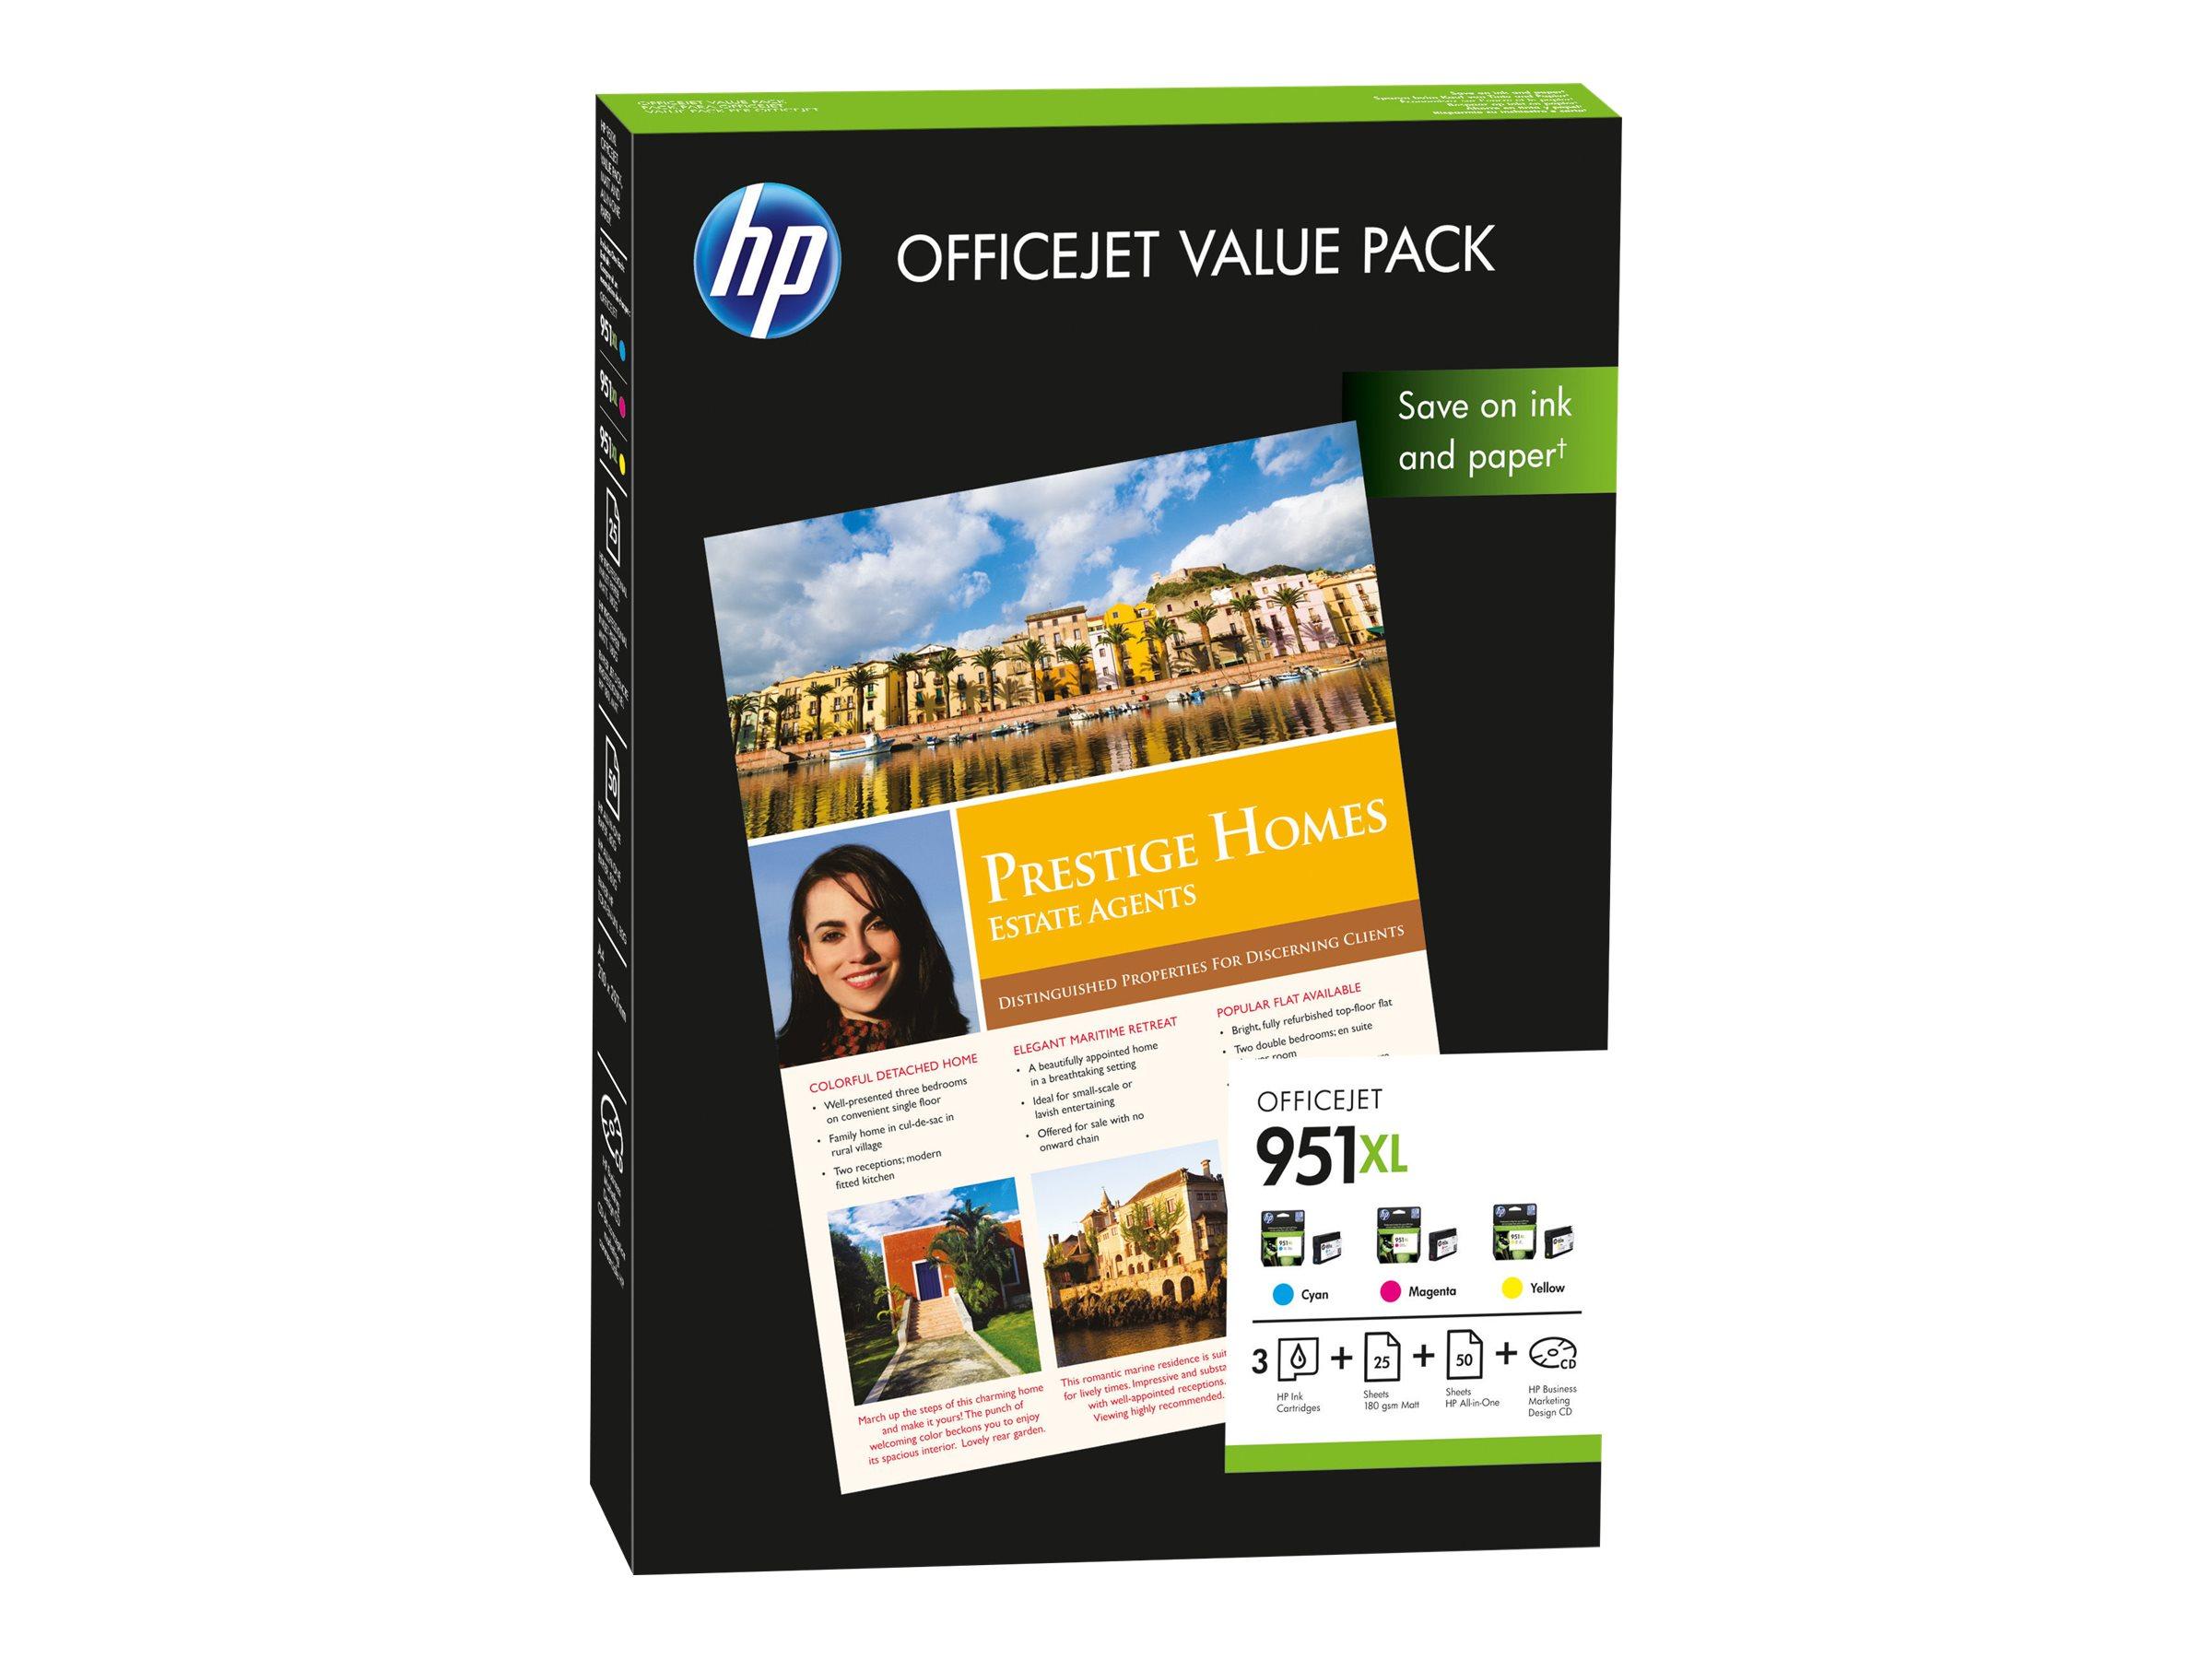 HP 951XL Value Pack - Gelb, Cyan, Magenta - Original - Officejet - Tintenpatrone / Papierkit - für Officejet Pro 251dw, 276dw, 8